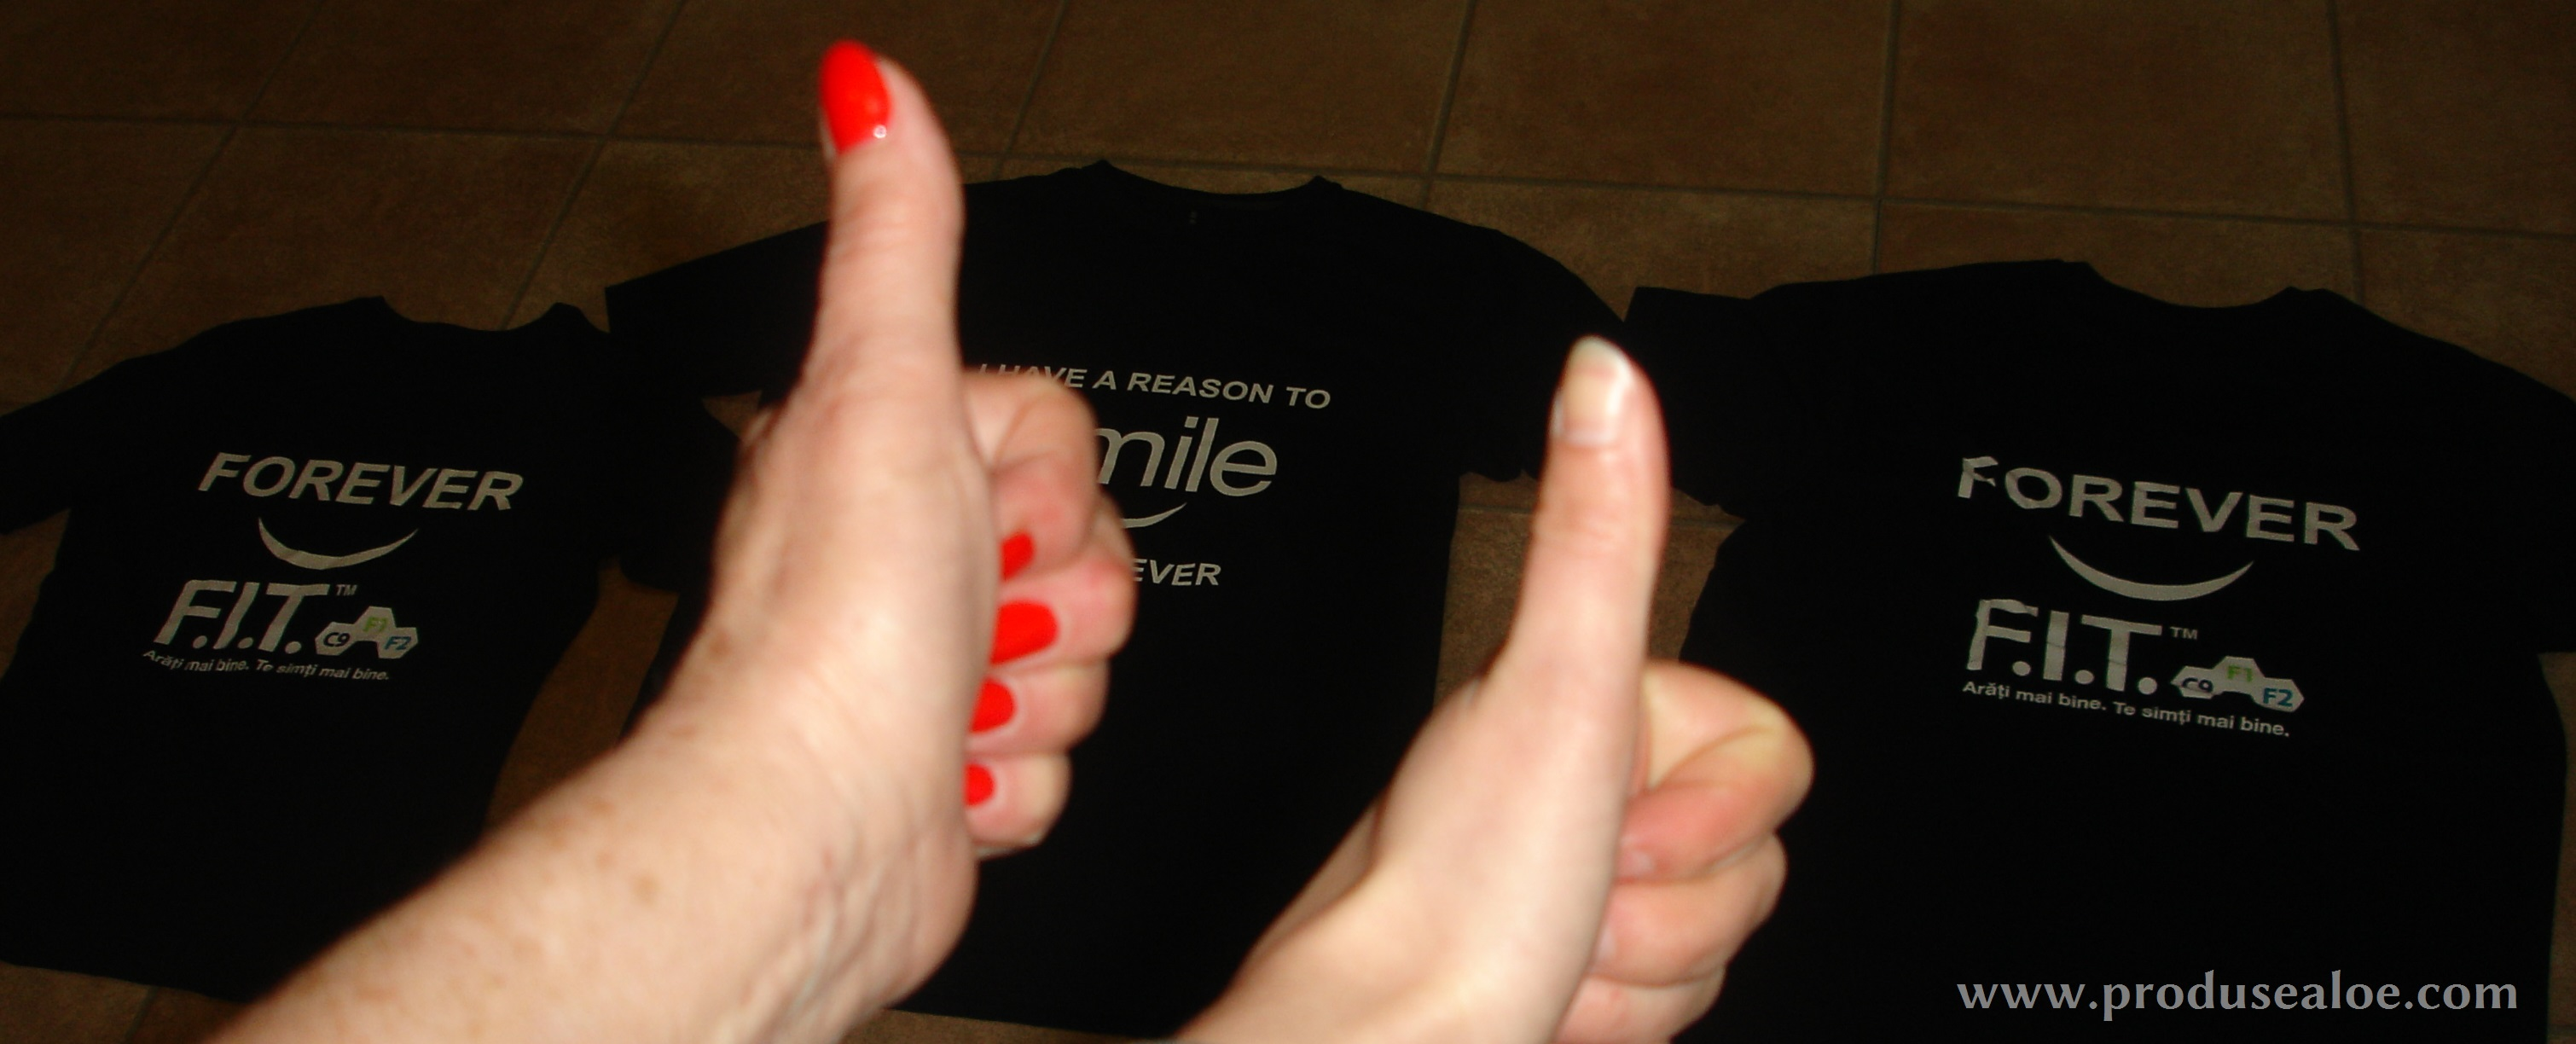 wow seminar oradea echipa eva szabo flp tricou smile